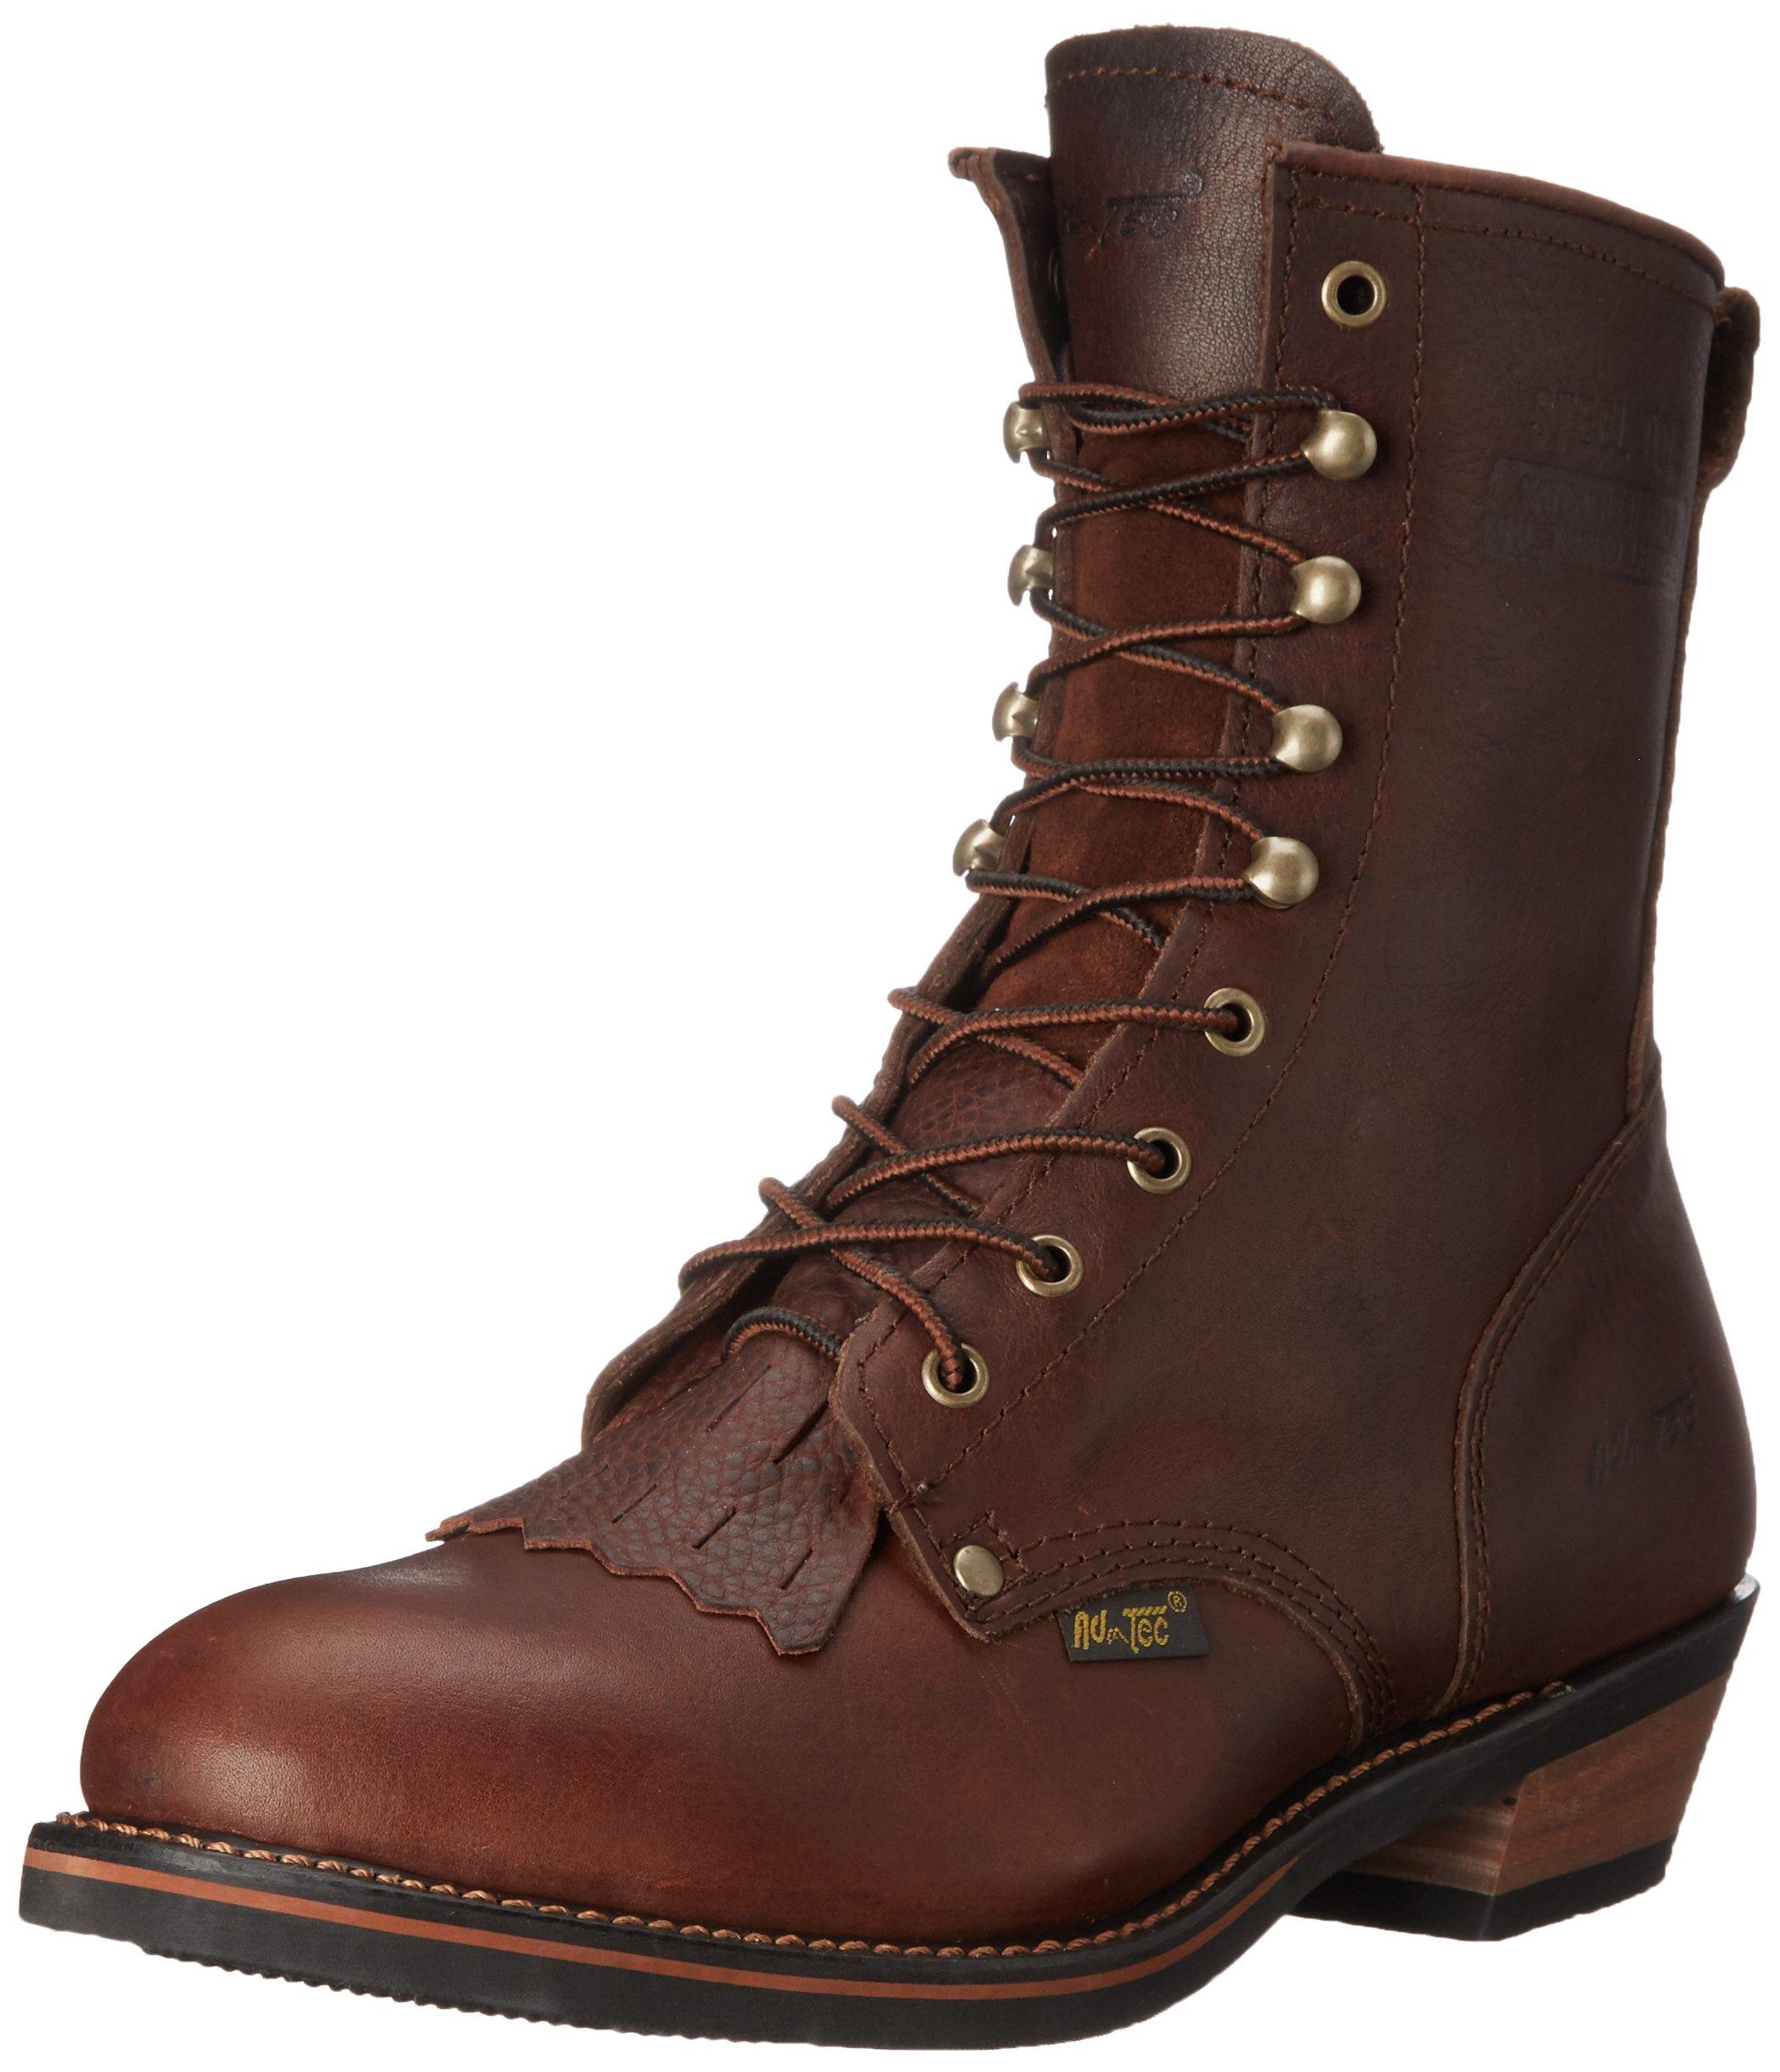 Adtec Men's 9 inch Steel Toe Packer Boot, Chestnut, 7.5 M US by Adtec